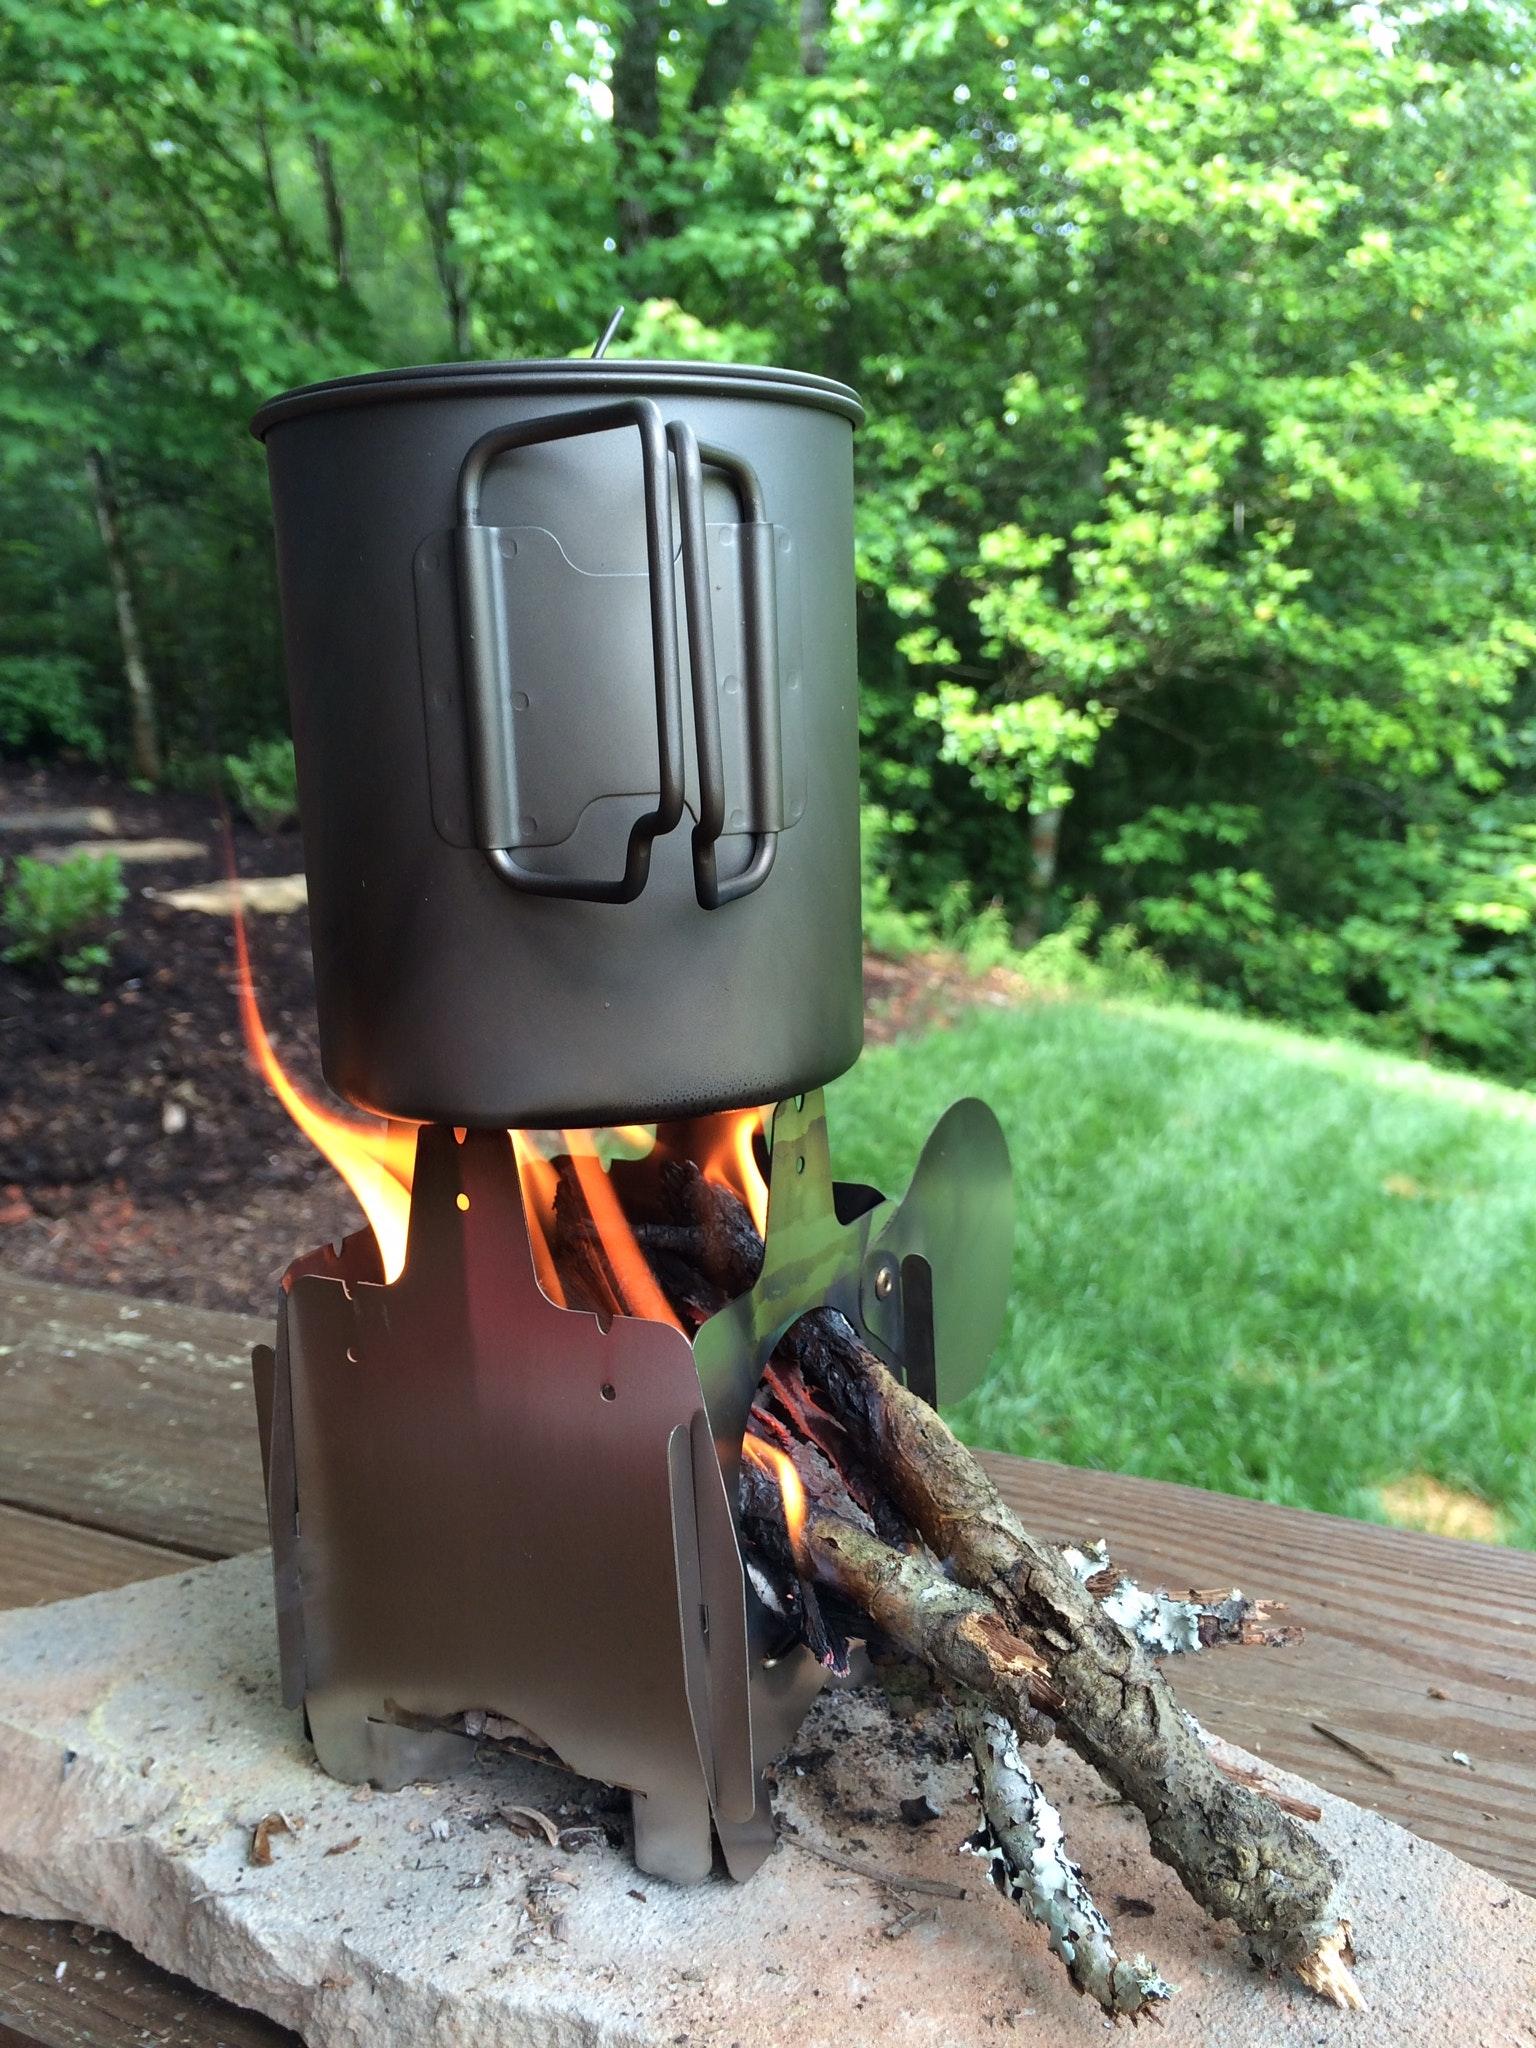 FireFly ultralight titanium wood stove 2.8 oz